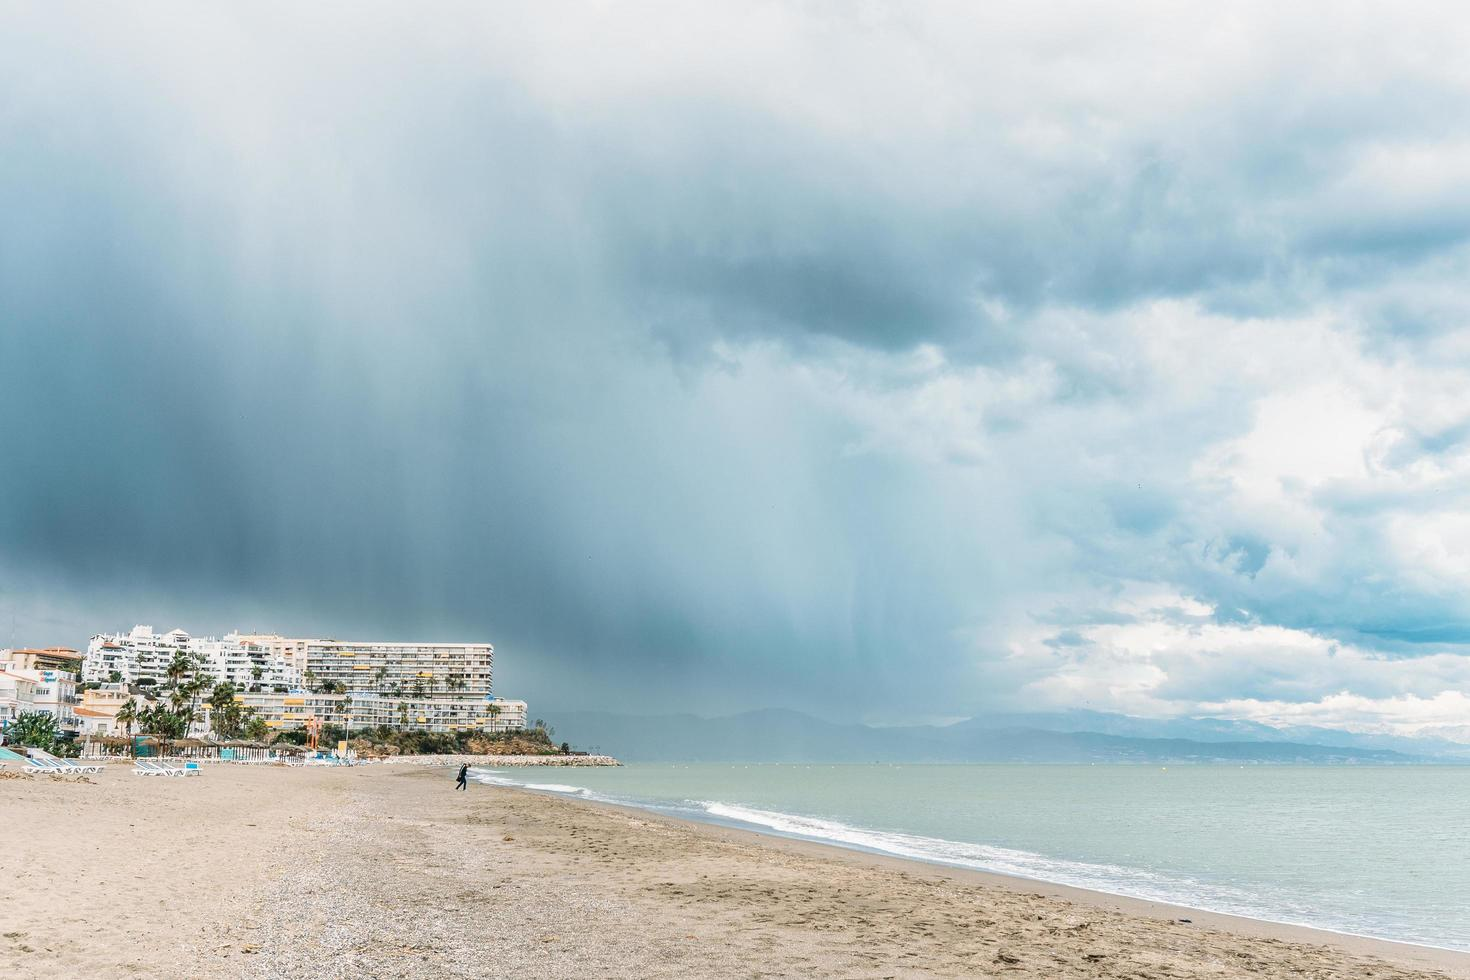 Rainfall at the beach photo